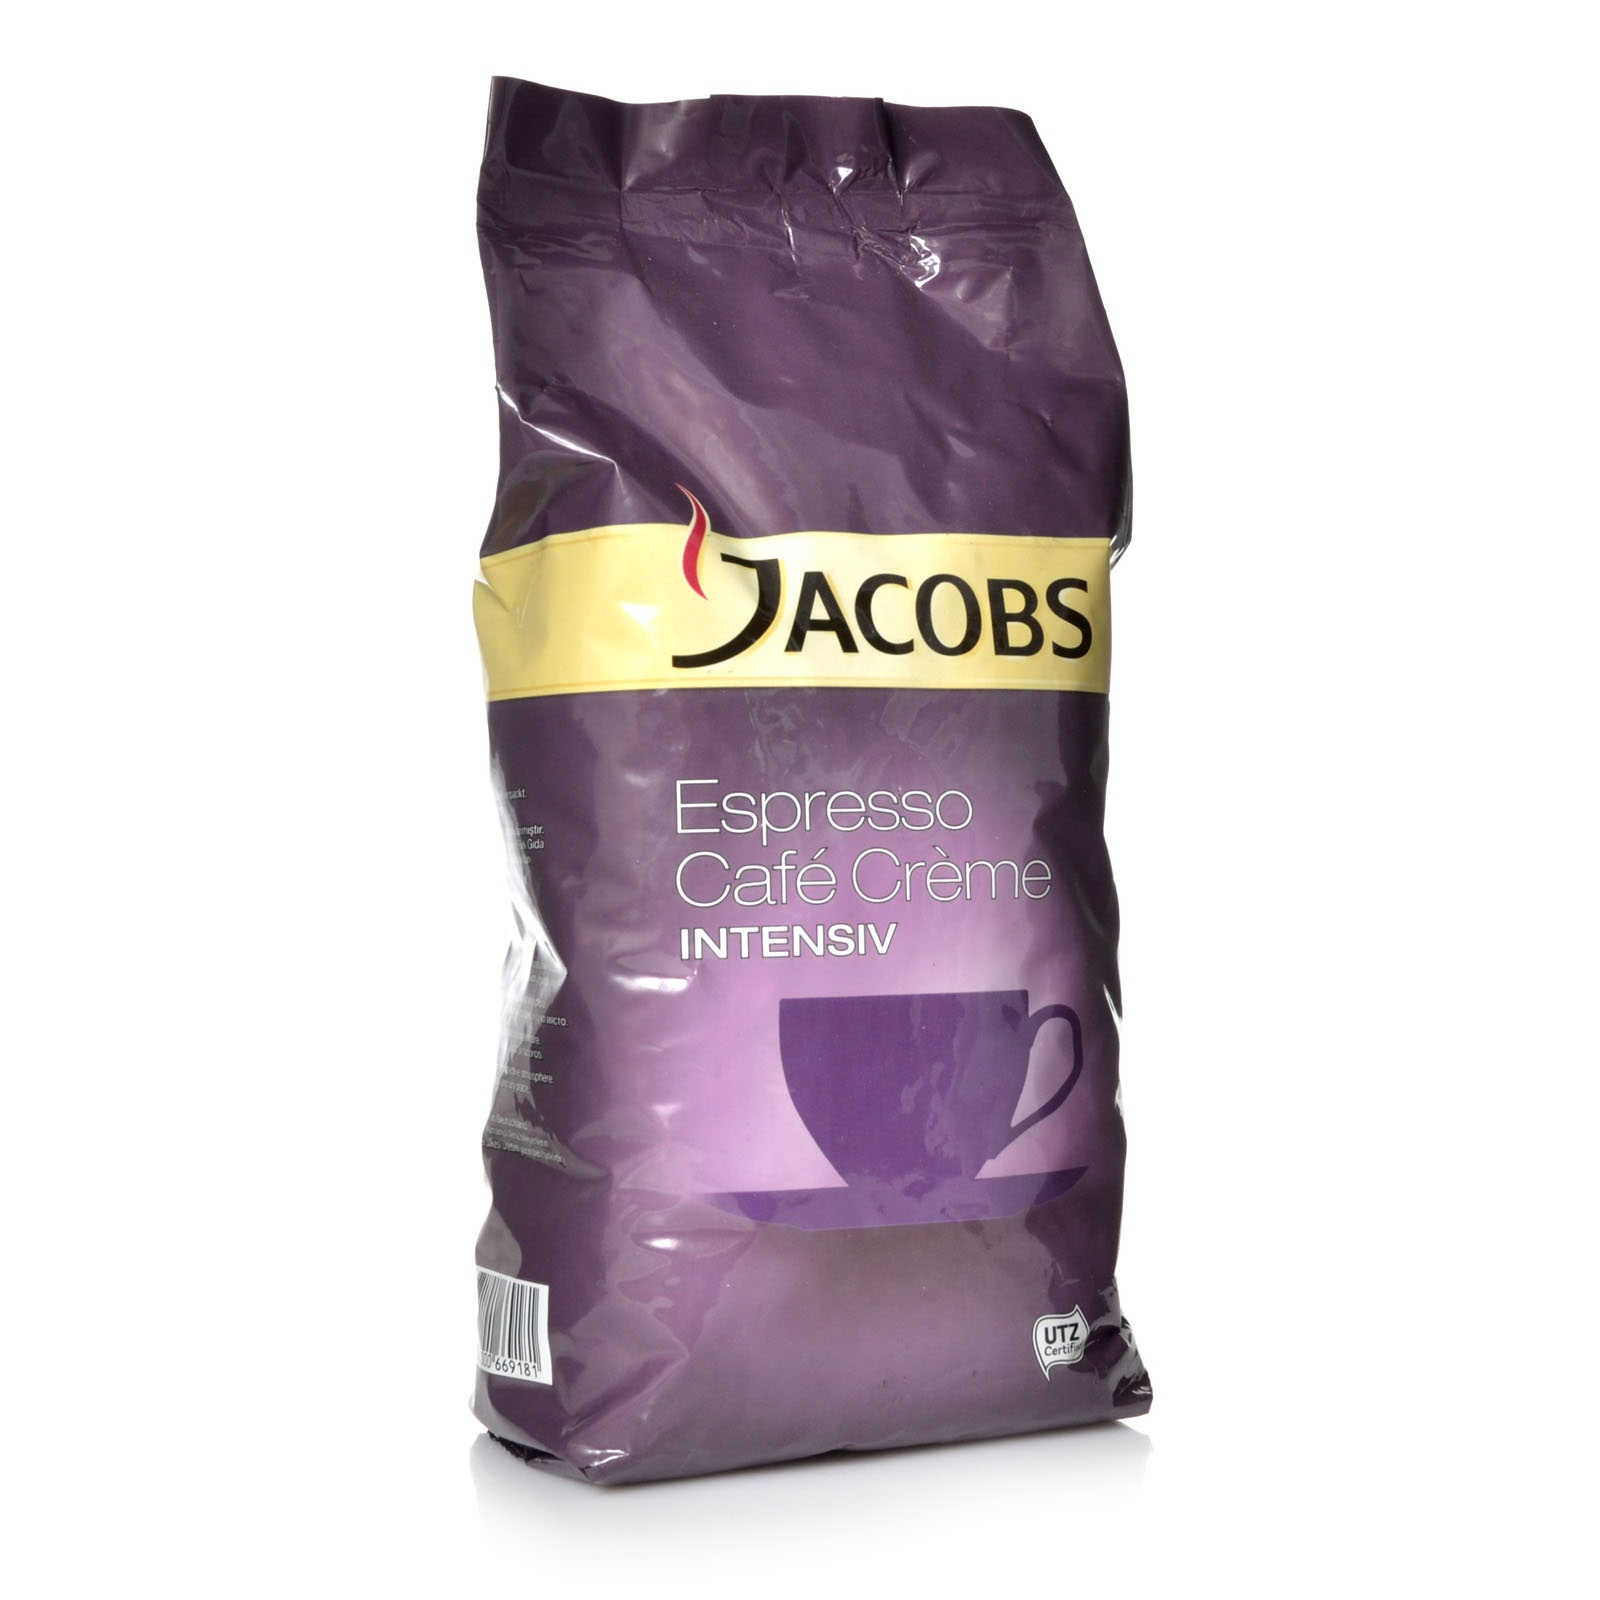 Jacobs Intensiv Espresso Café Créme 1000 g = 1,00 kg ganze Kaffee-Bohne